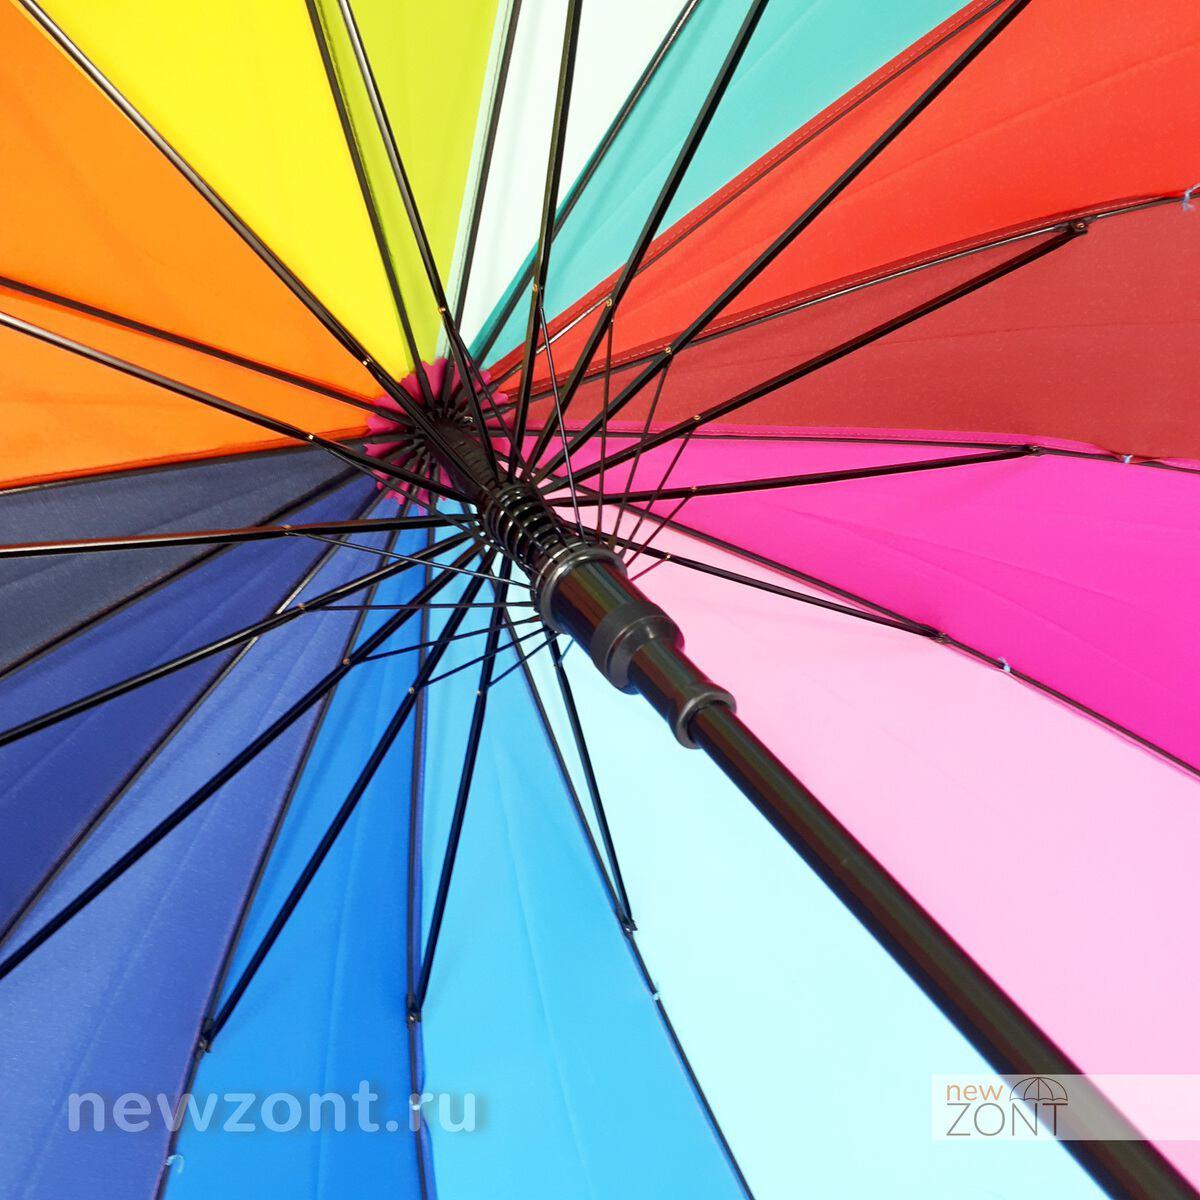 Купол зонта радуги изнутри